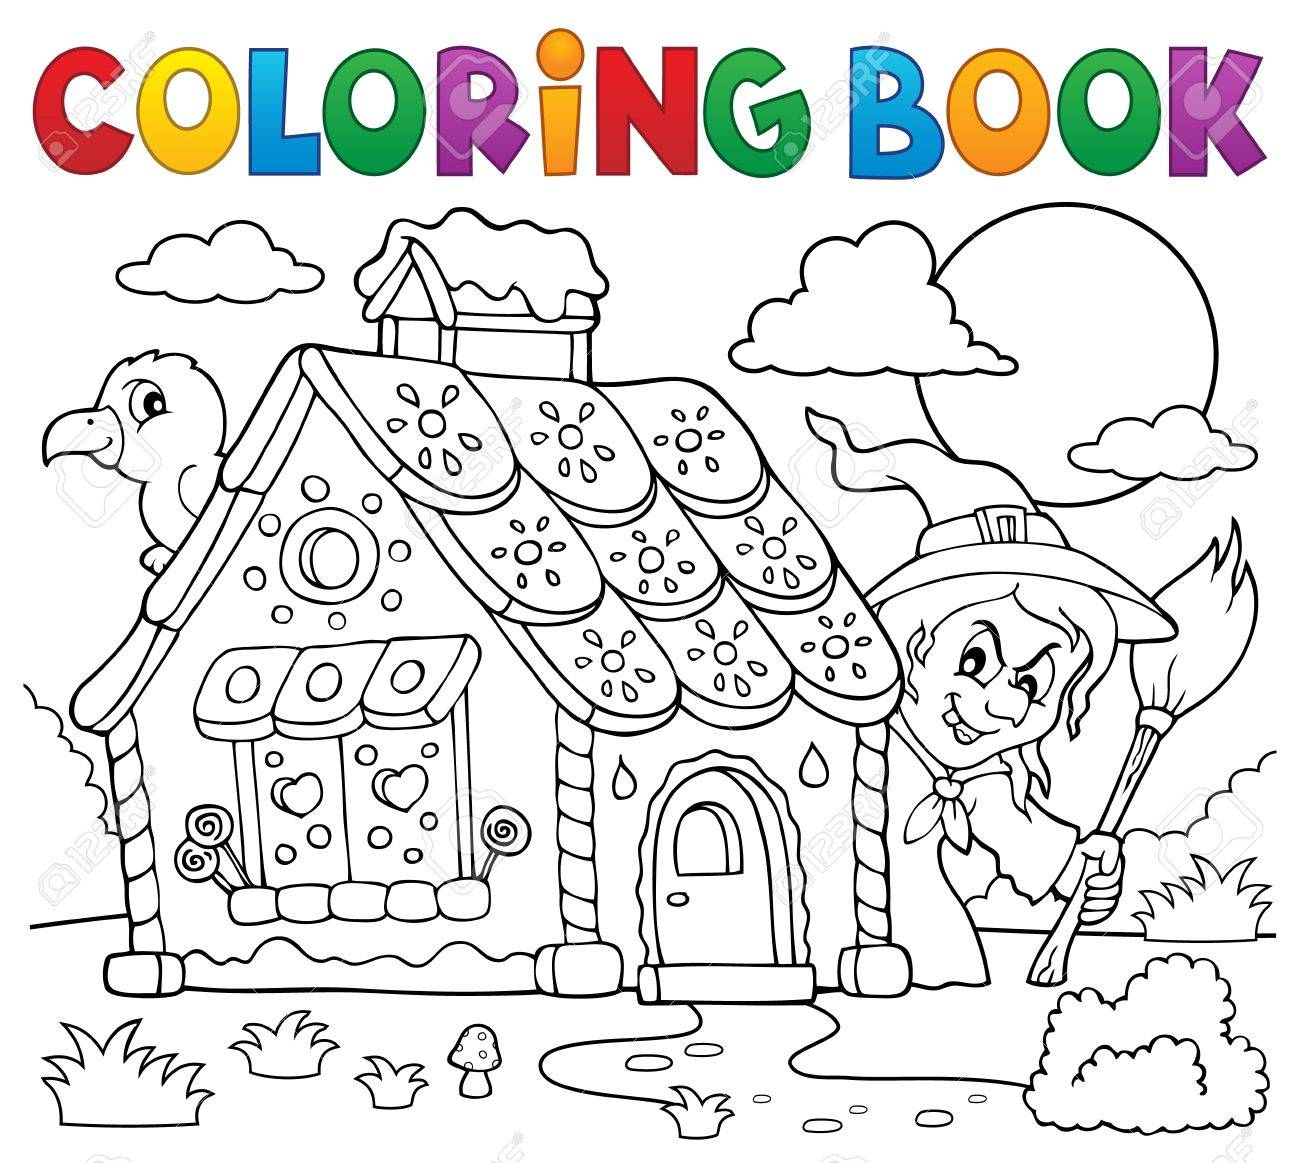 Dibujo Para Colorear Casa De Pan De Jengibre Tema 2 Eps10 Ilustración Vectorial